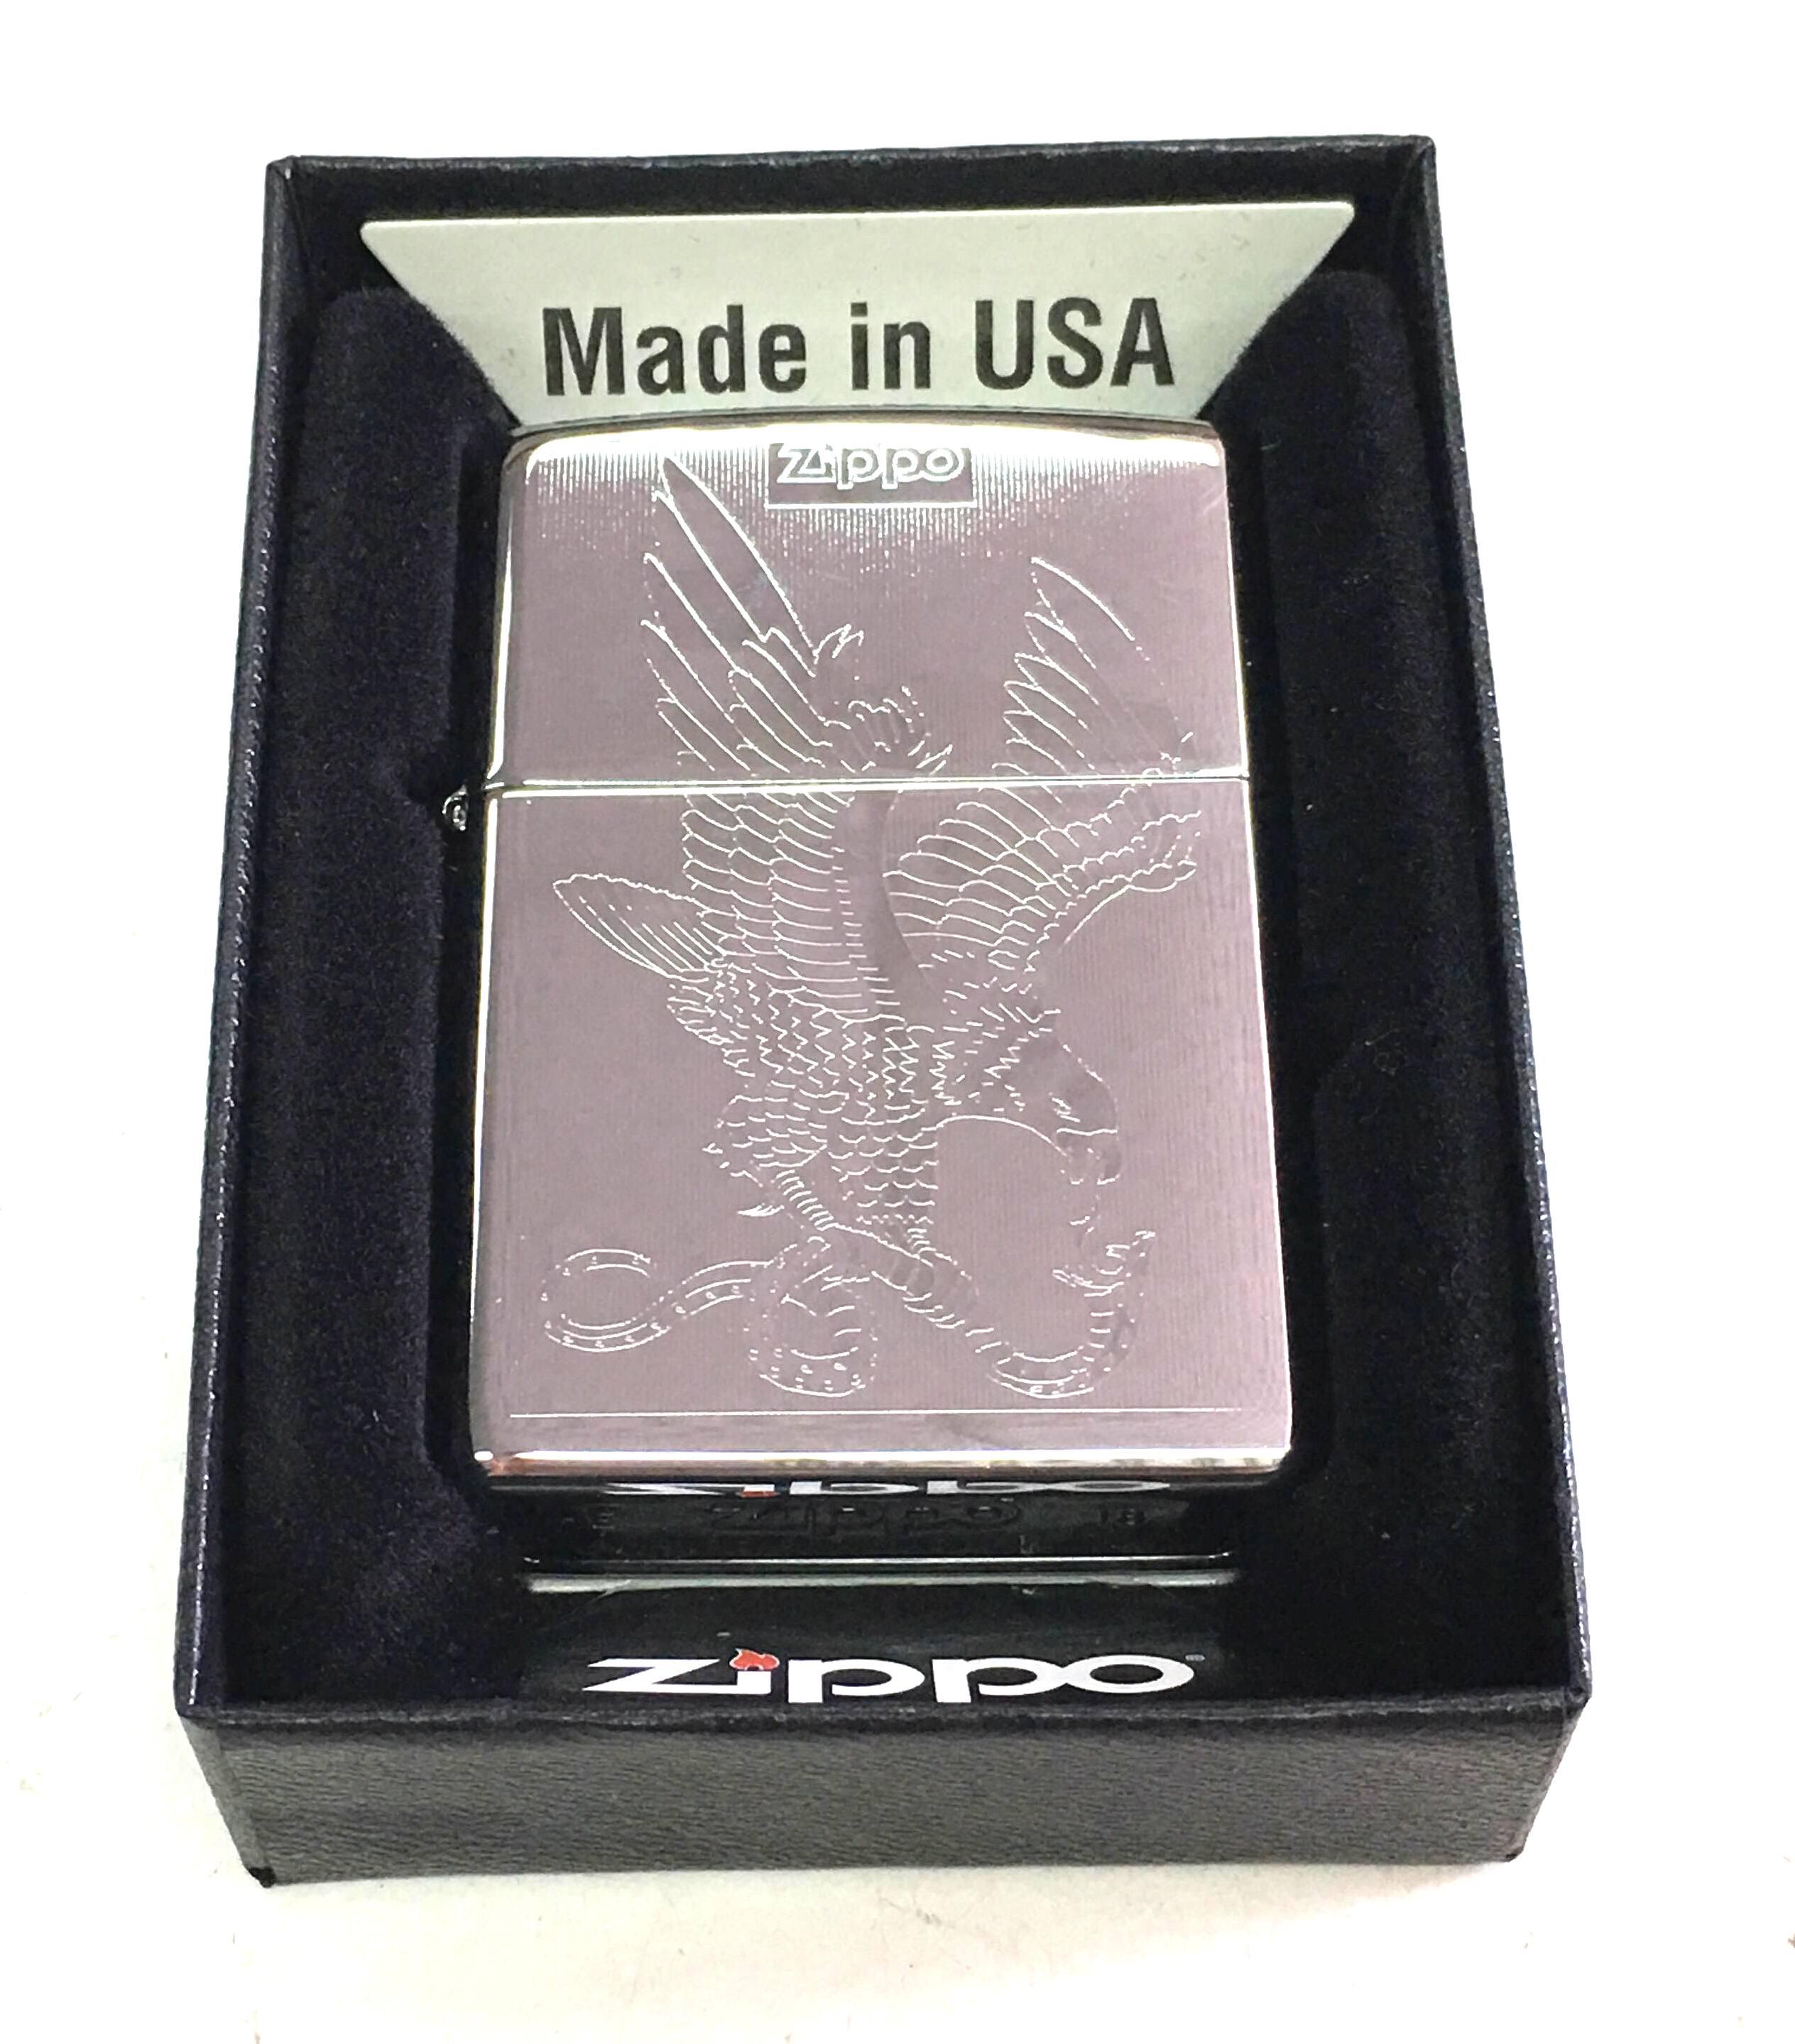 Zippo bong suot 1 mat hinh dai bang Z663